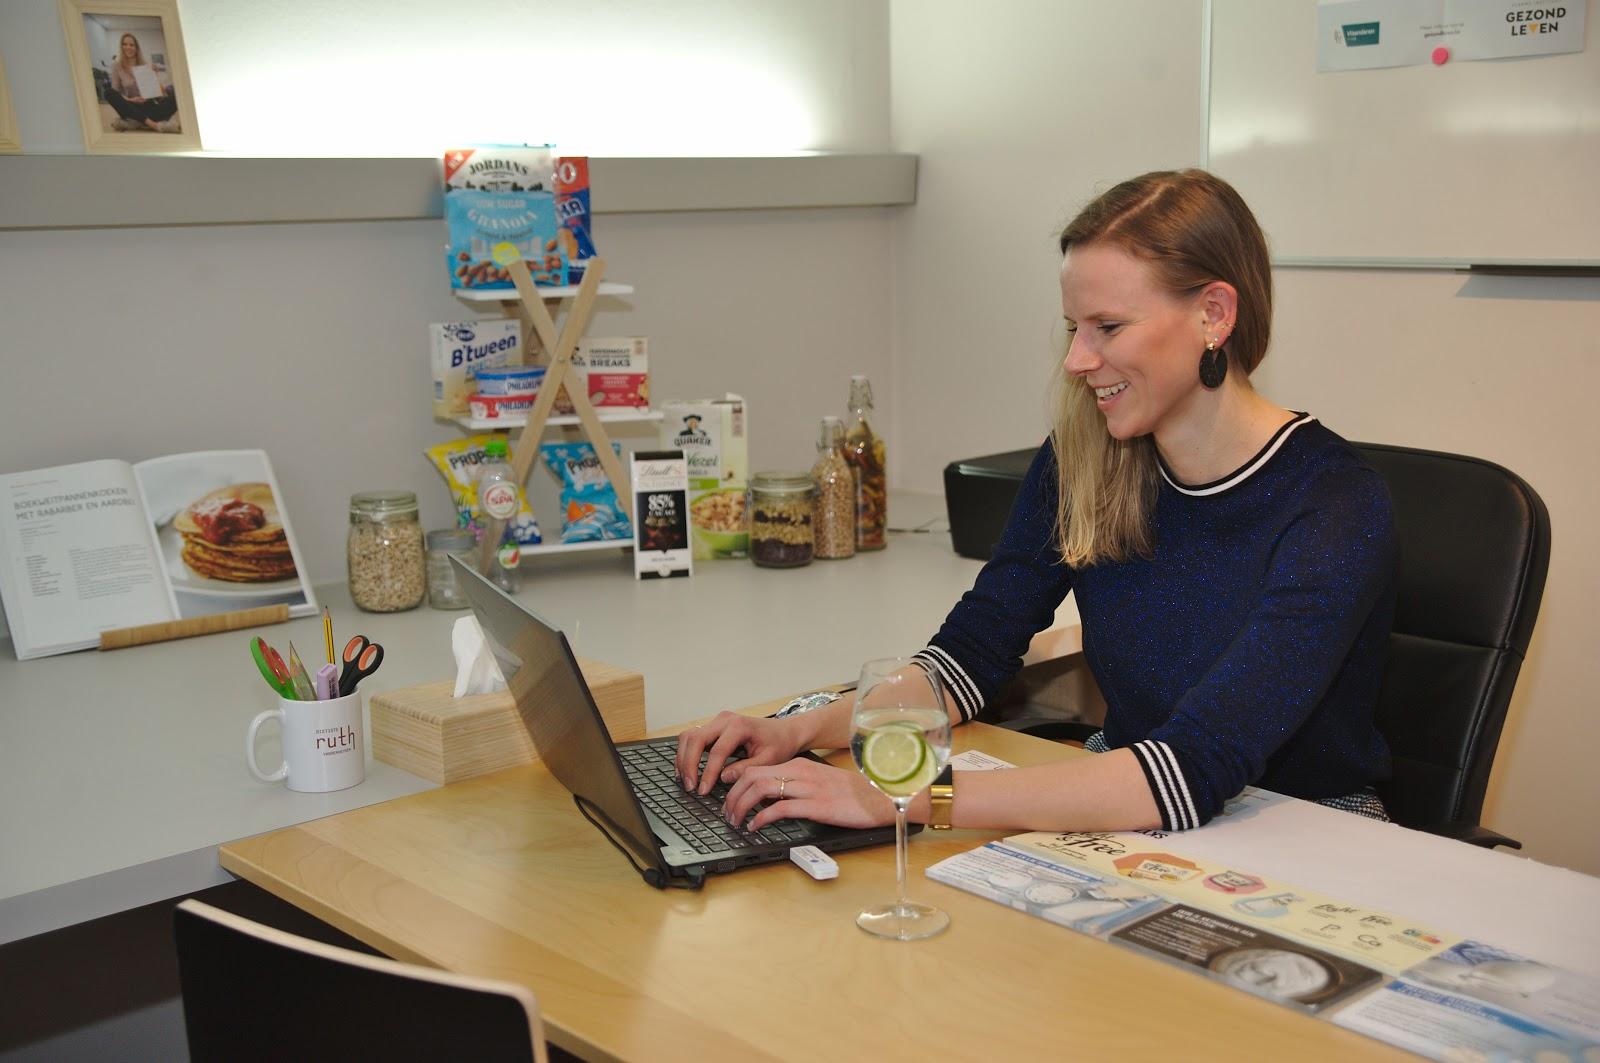 praktijk Pelt, diëtistenpraktijk, sportdiëtiste Ruth Vanderheyden, sportvoeding, online coaching, beweegadvies, online workshop, webinars